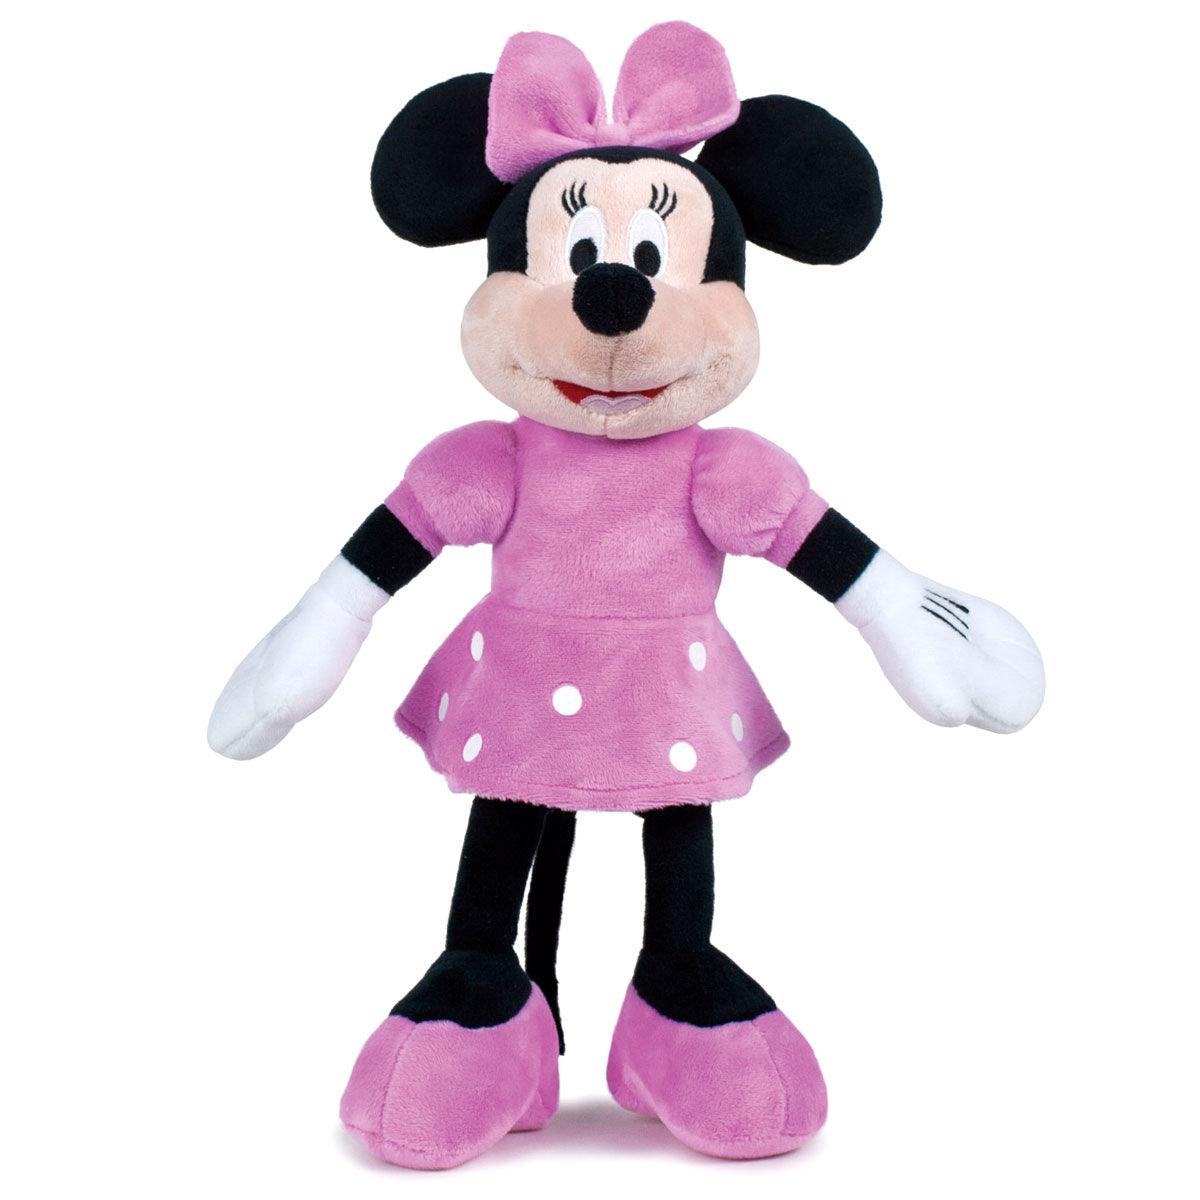 Peluche Minnie Disney soft 53cm 842561137741912244720